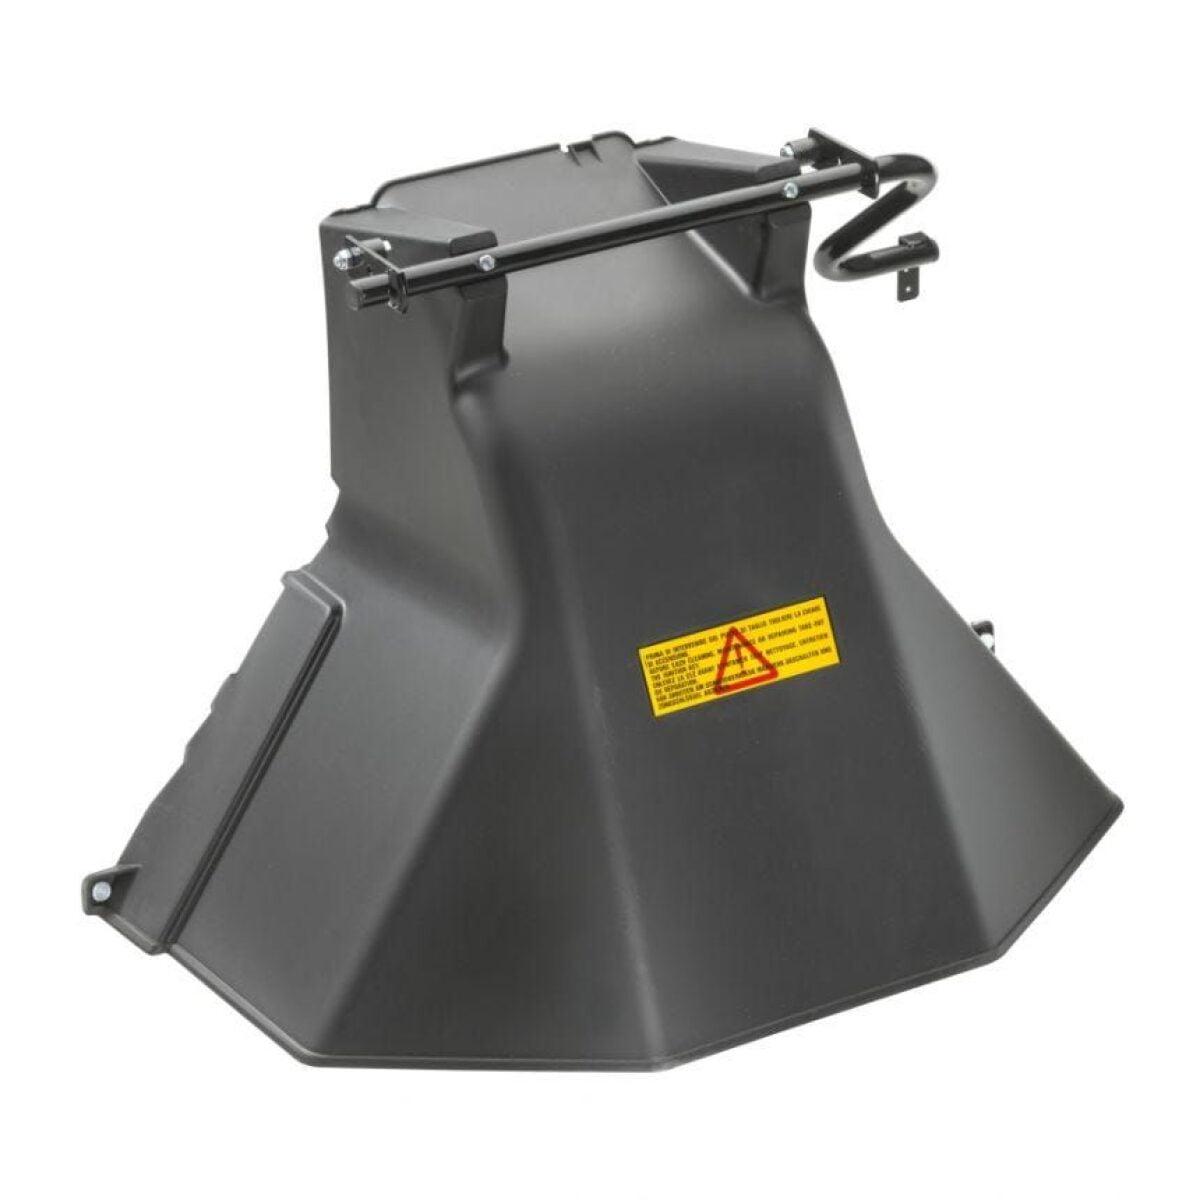 deflector spate tractoras stiga 92 102 cm 299900051 0 o mac.ro